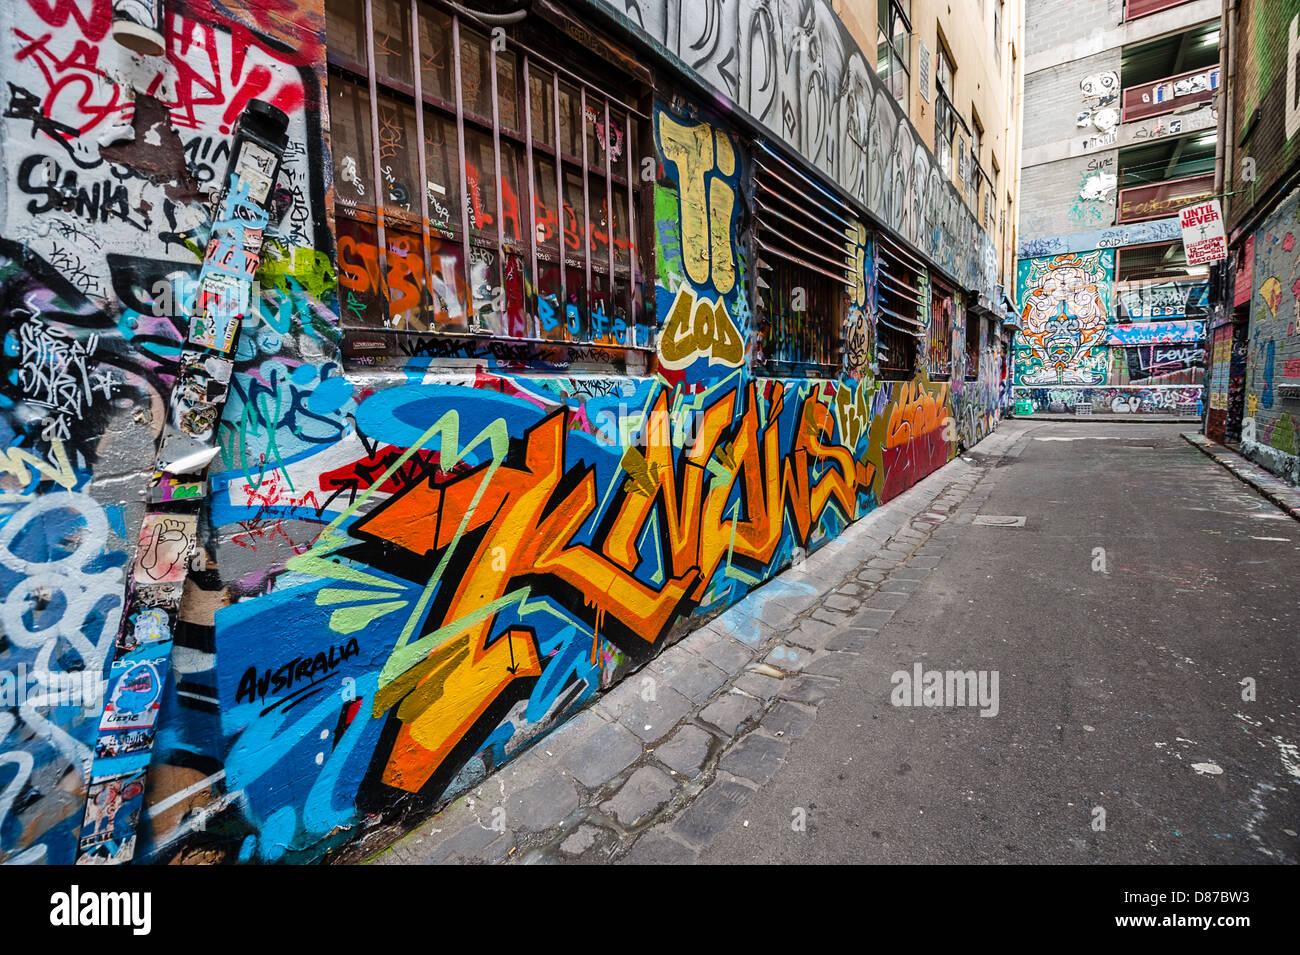 Melbourne's Hosier Lane is a celebrated landmark where legal street art decorates the walls. - Stock Image